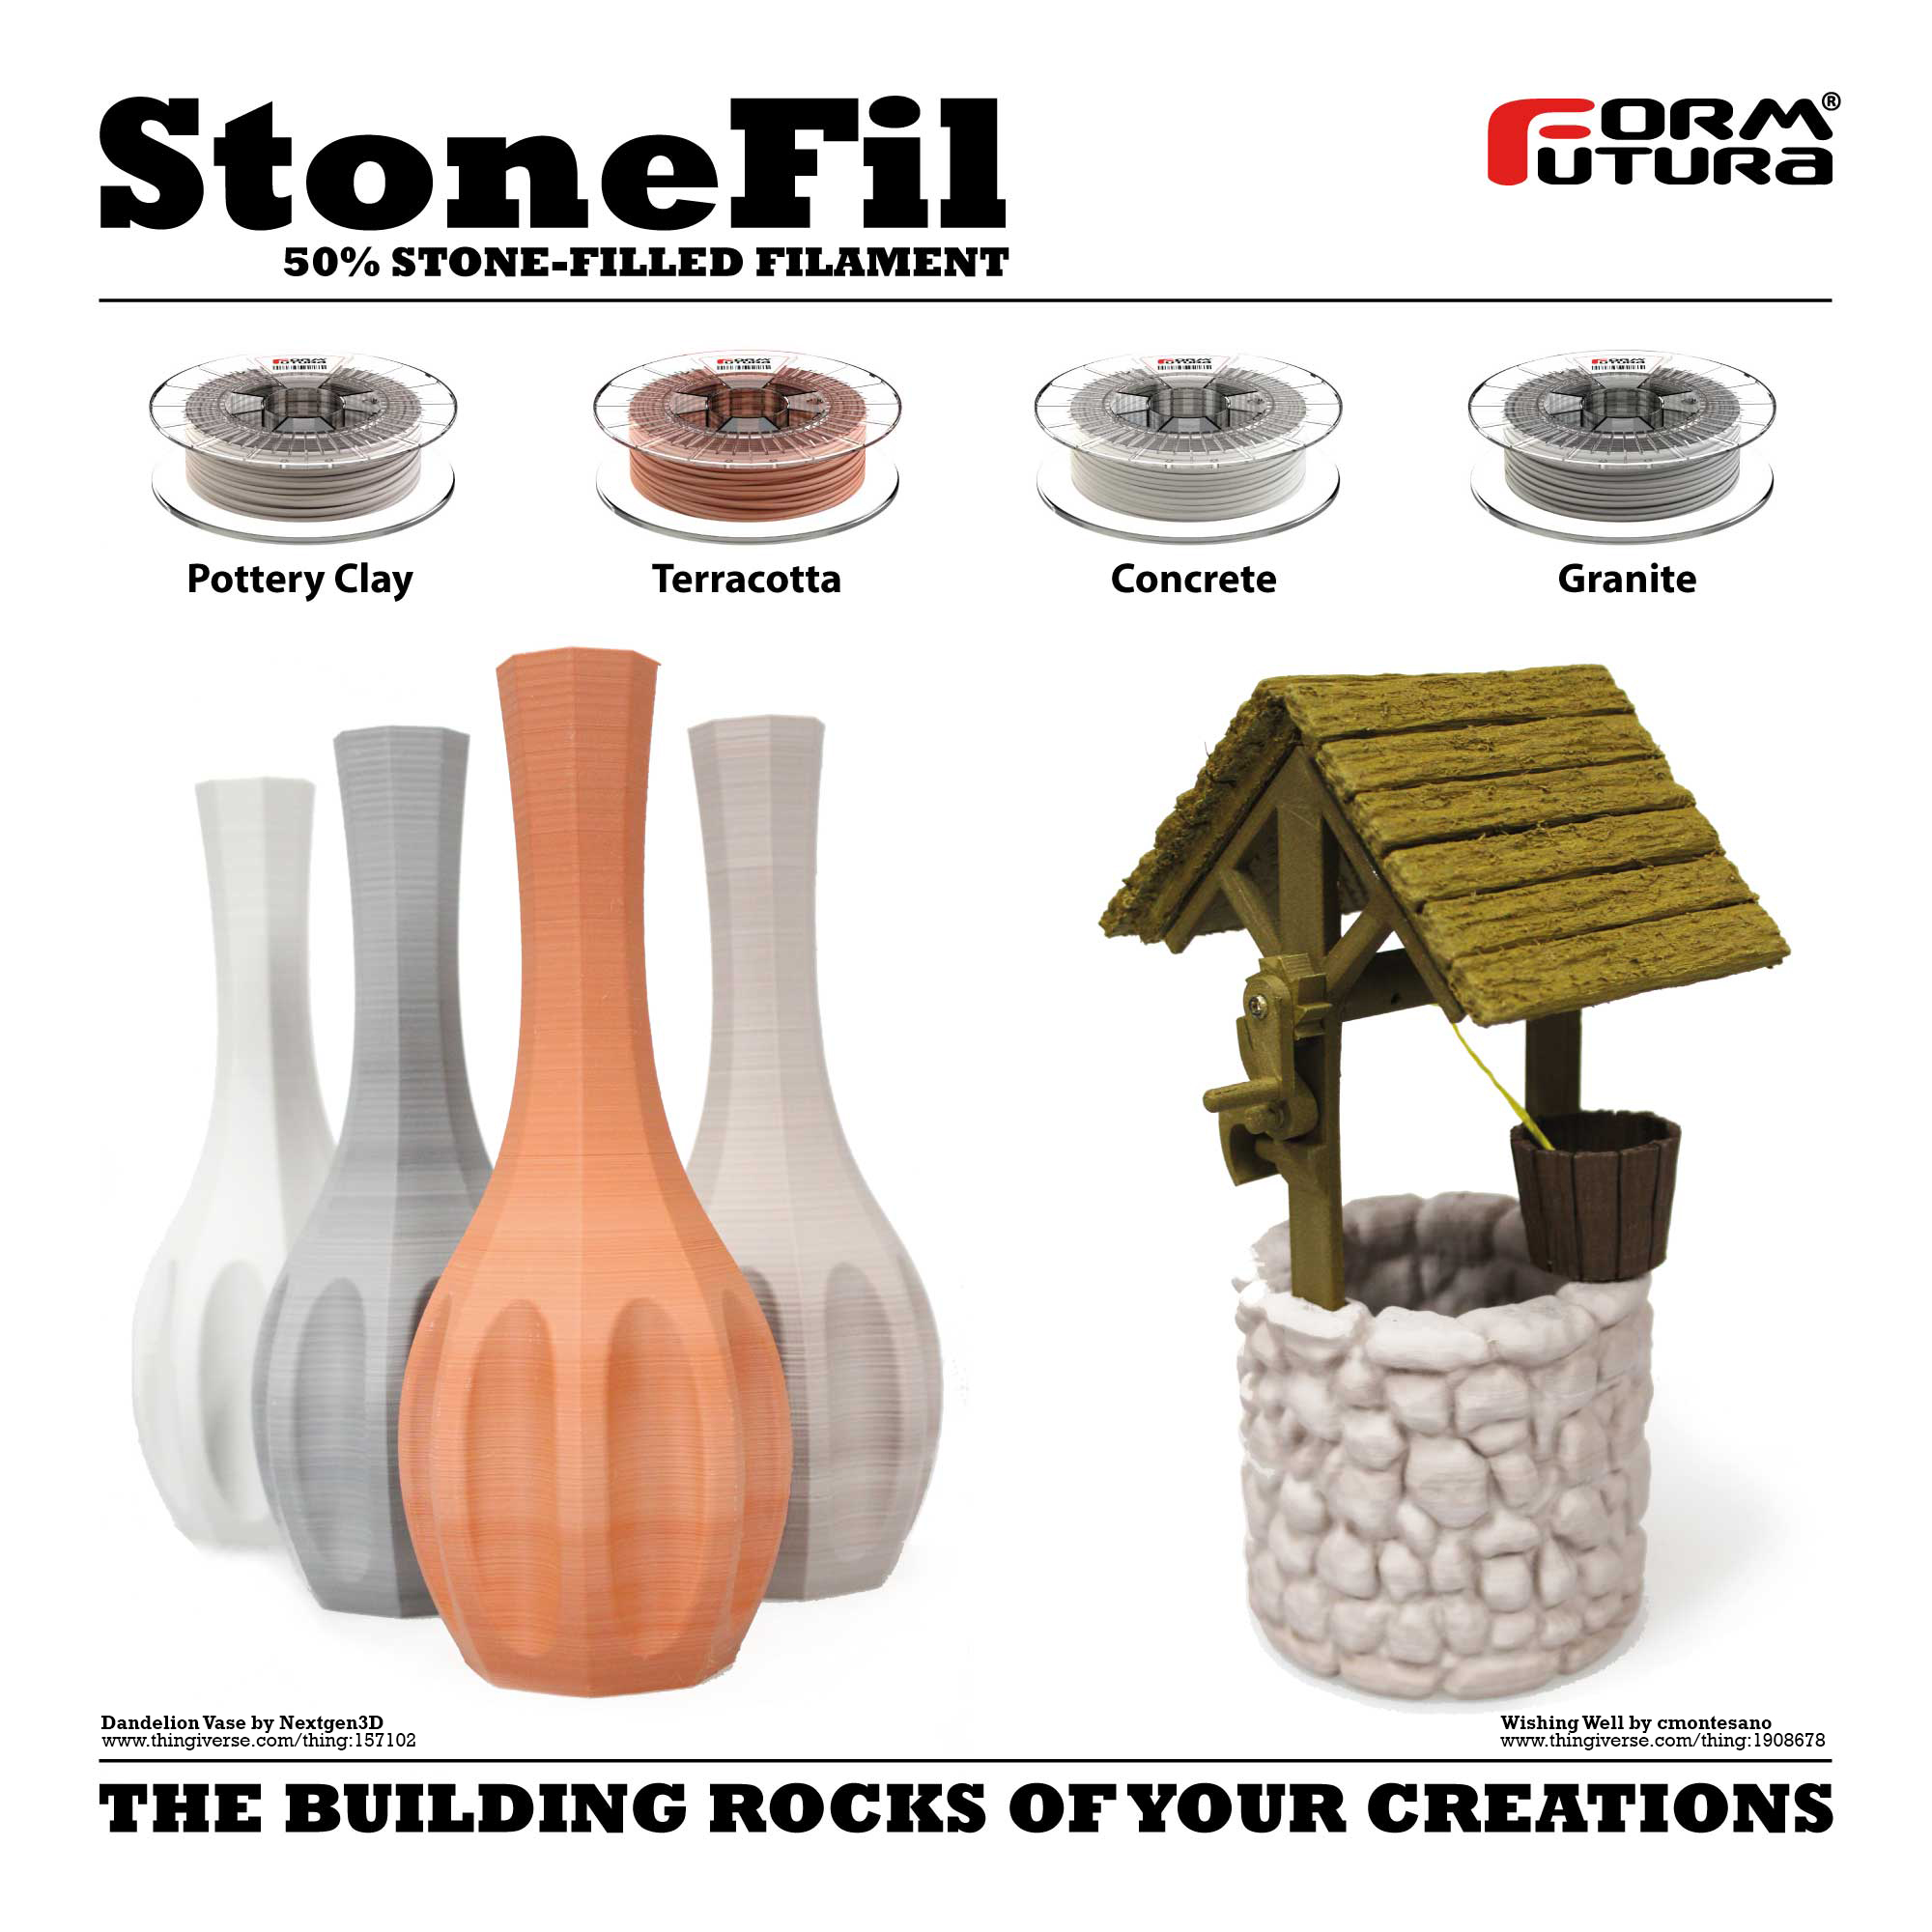 StoneFil™ Filament